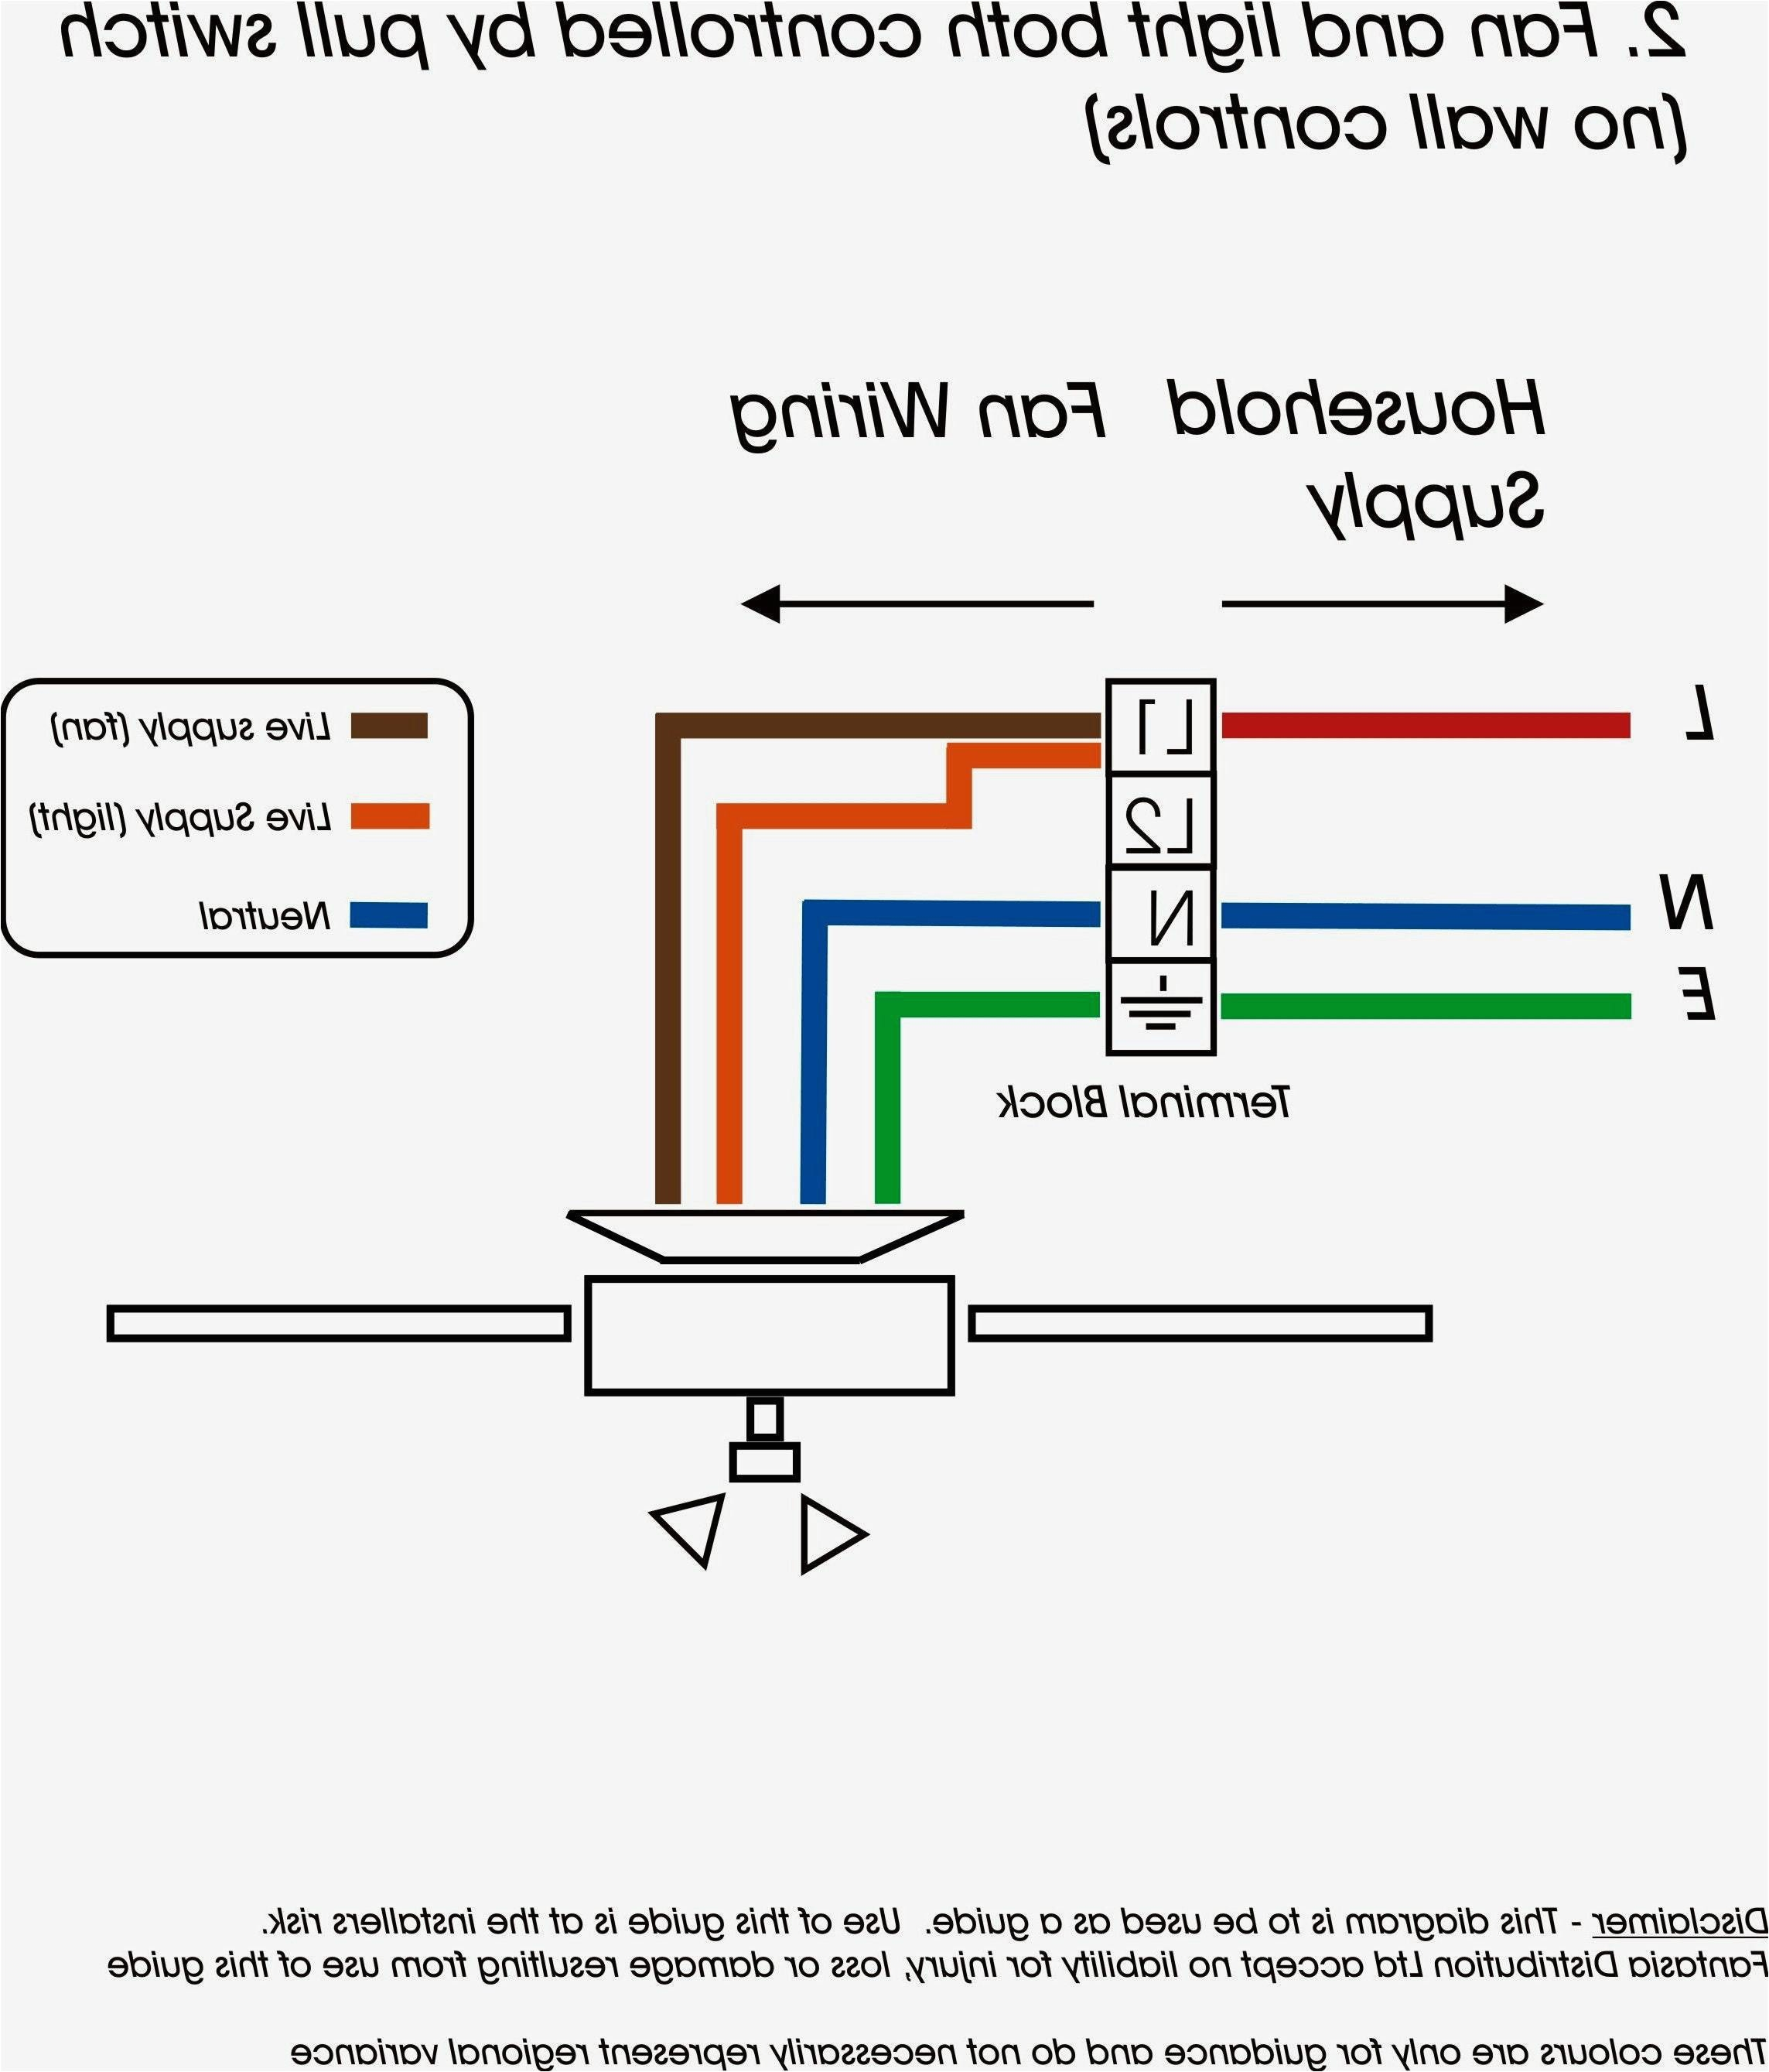 narva flasher wiring diagram new narva driving lights relay wiring diagram save best wiring diagram